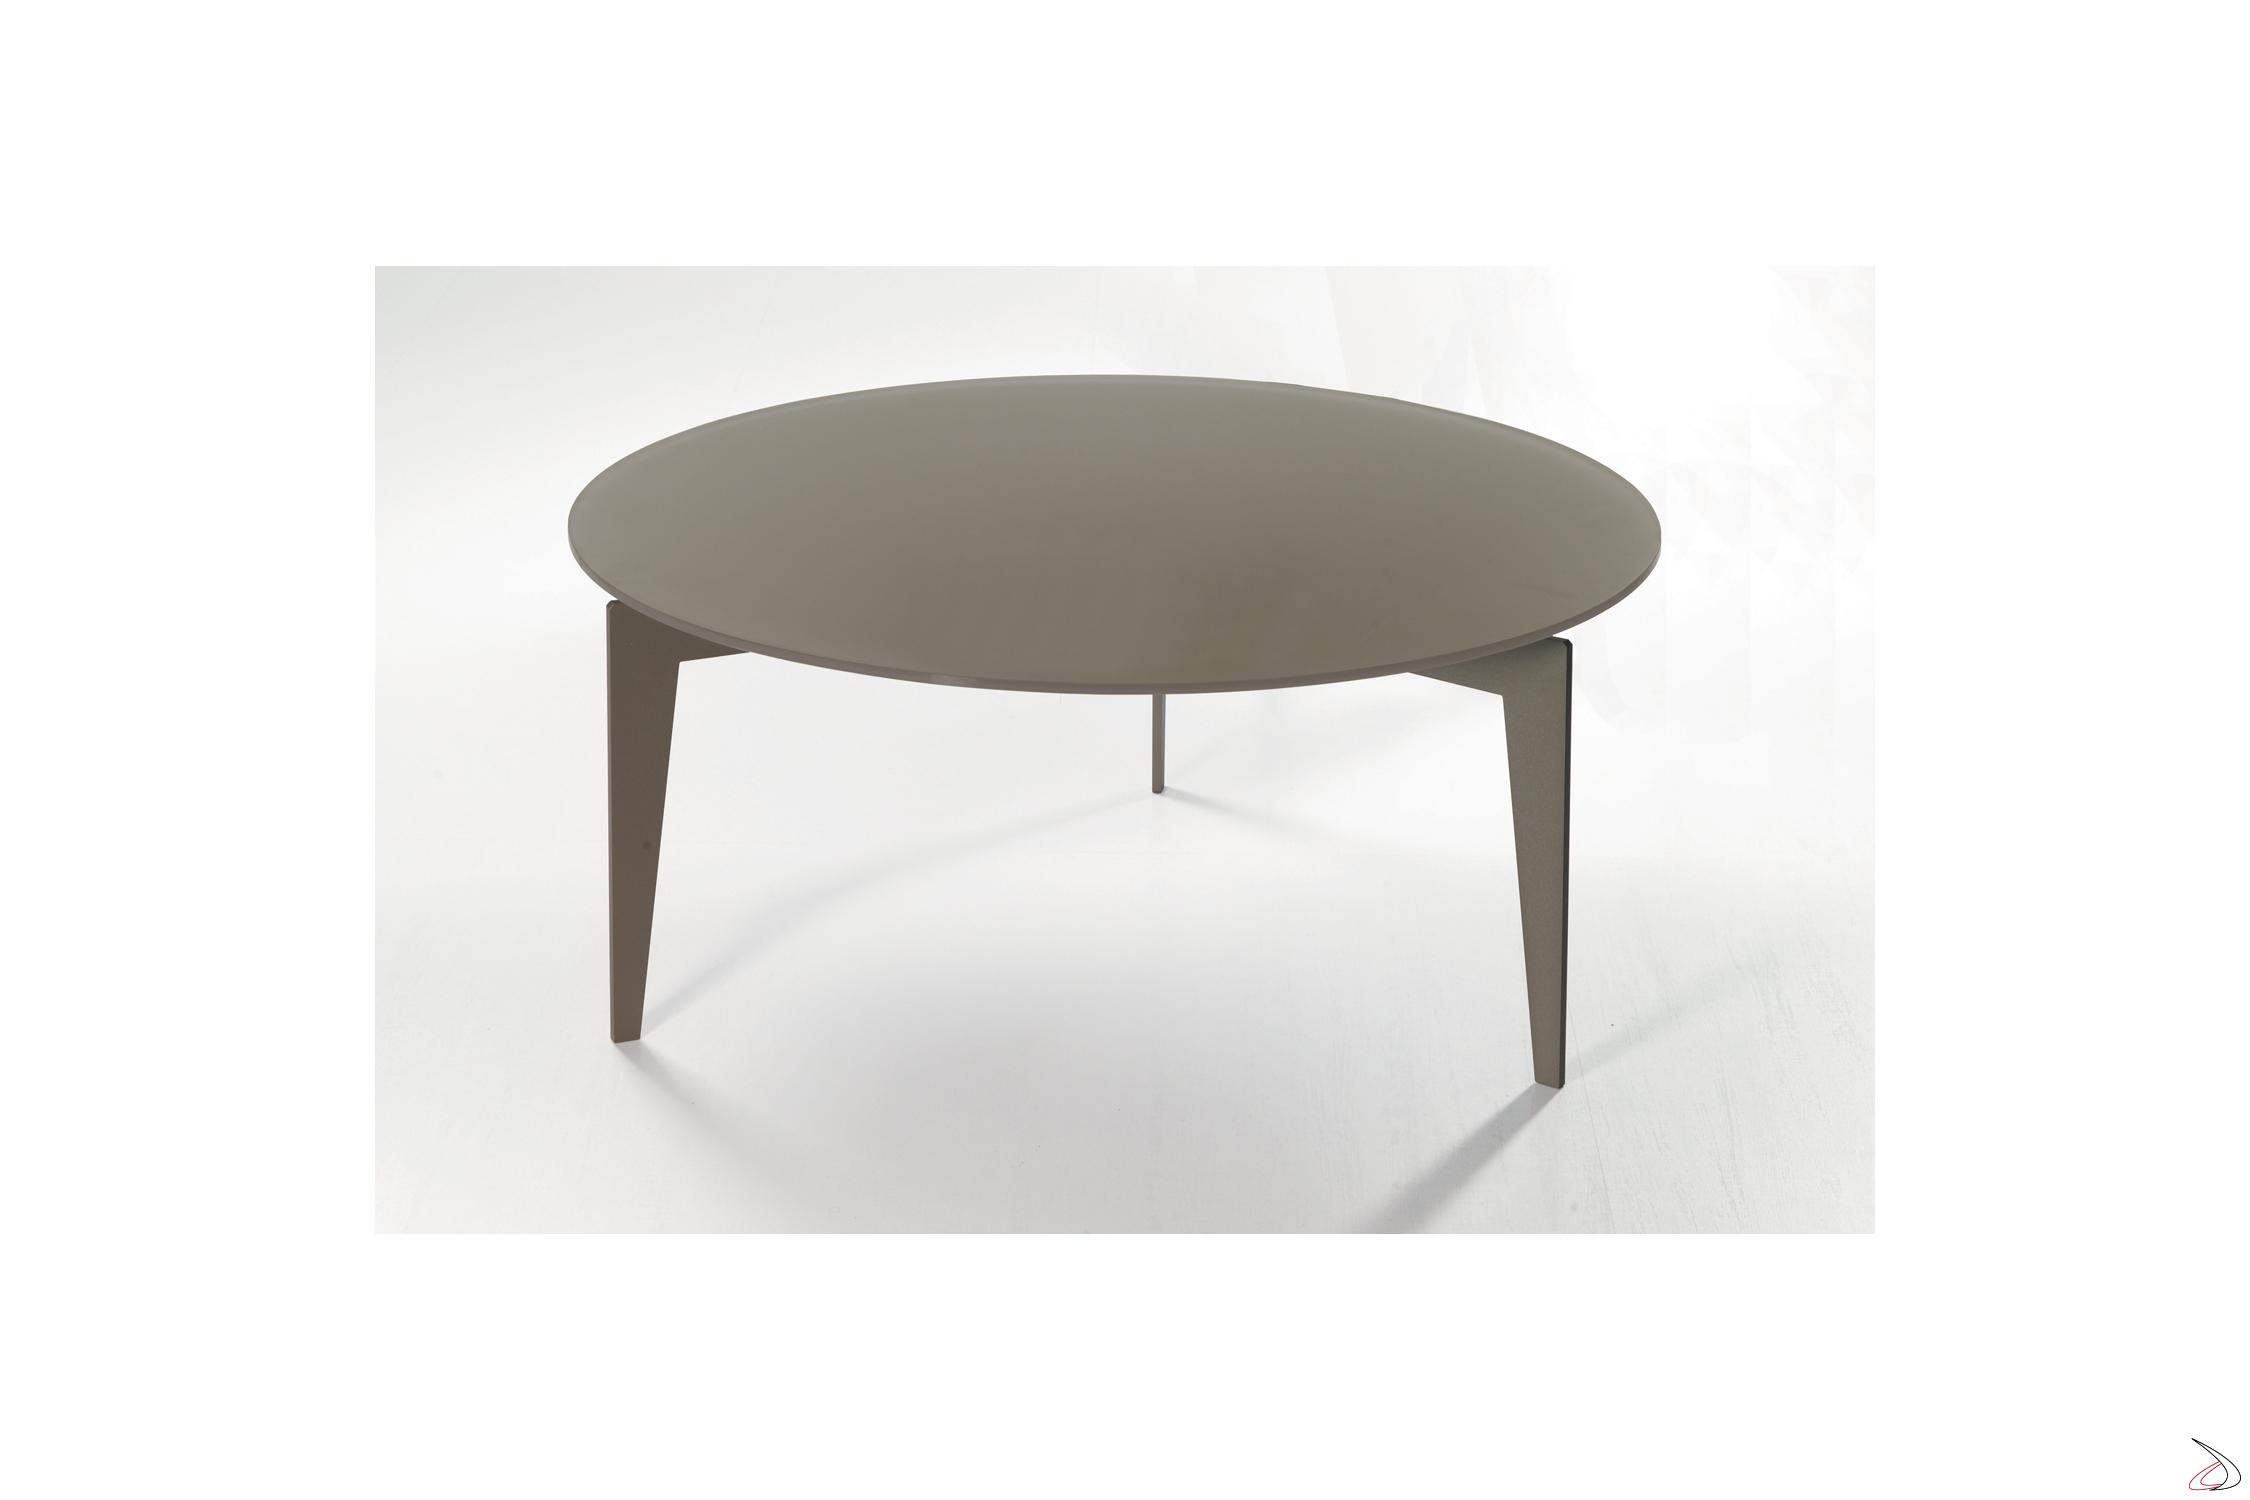 Tavolino Basso Rotondo.Tavolino Nordic